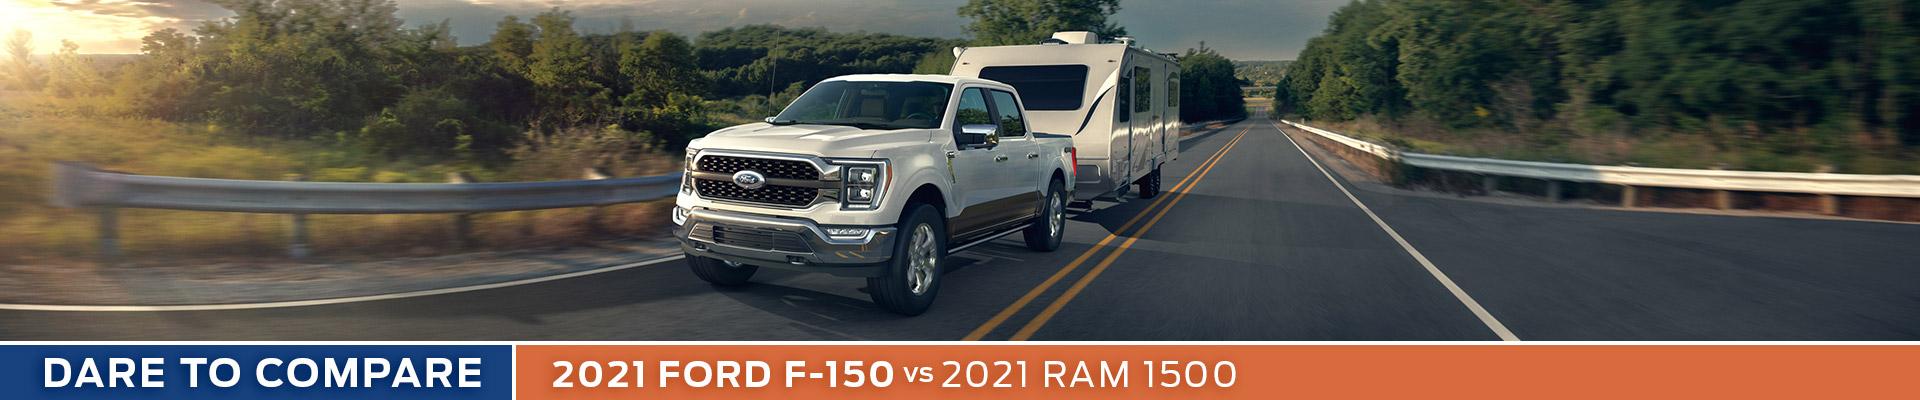 2021 Ford F-150 vs. 2021 Ram 1500 - Sun State Ford - Orlando, FL